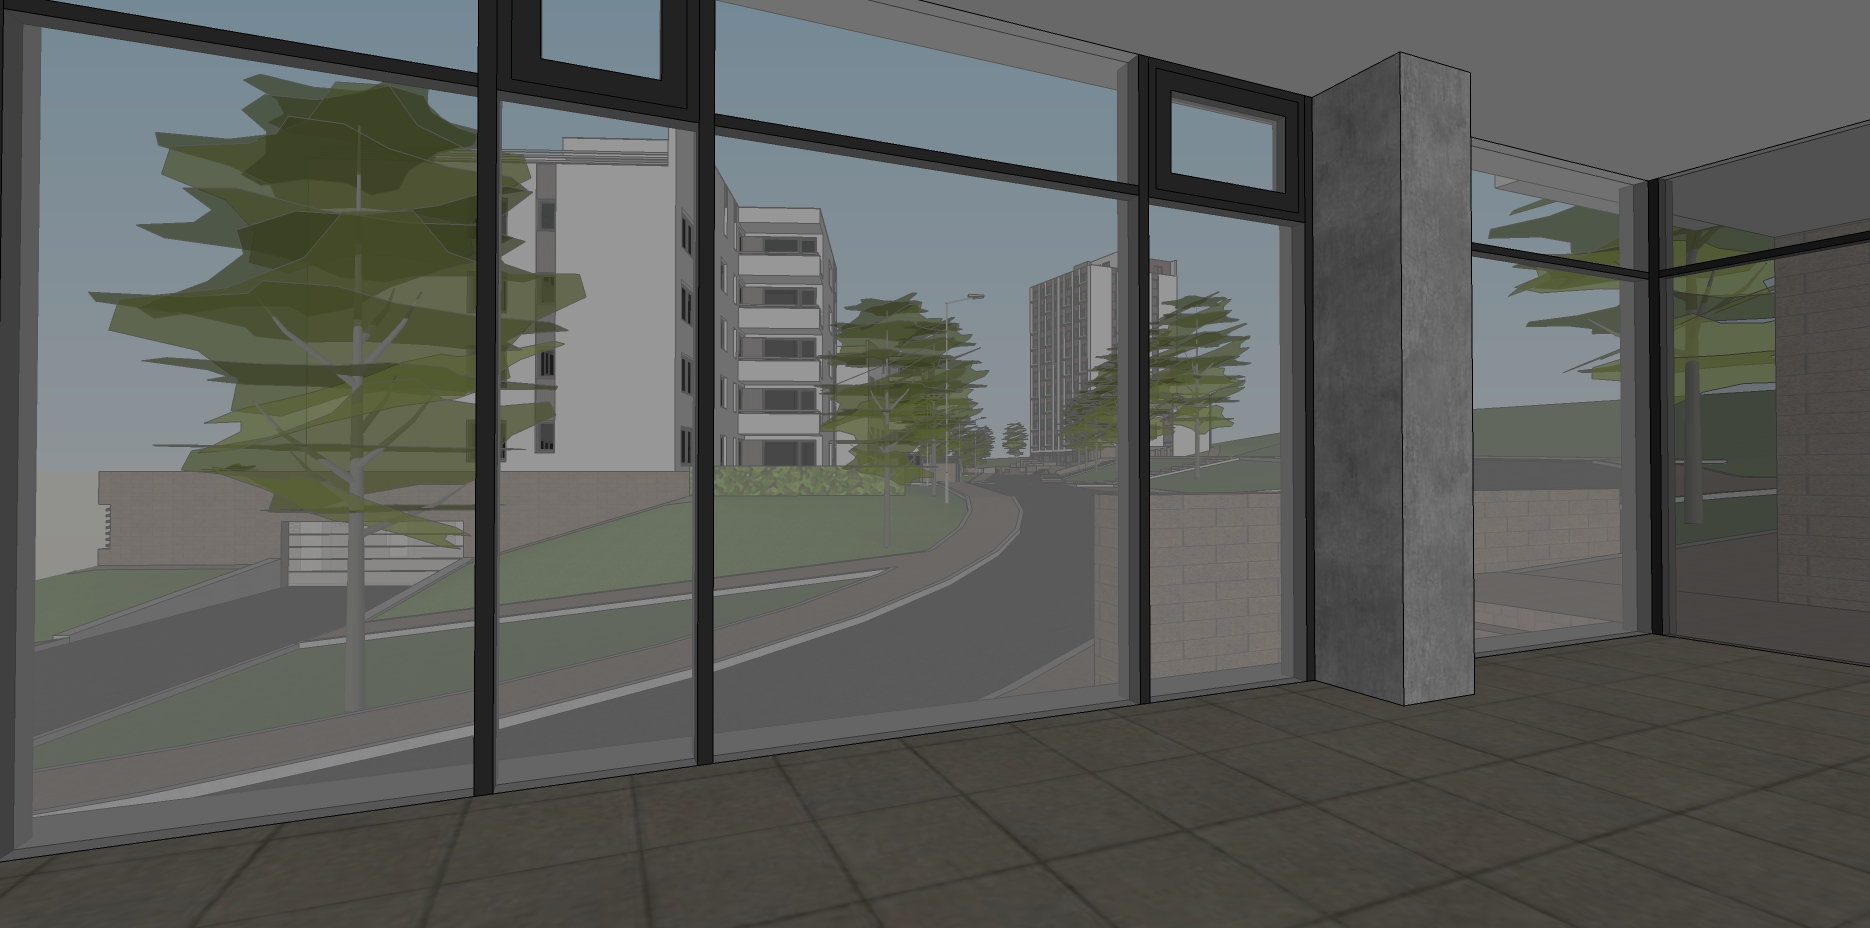 DruPASIV -studie eko-kom-bydlení